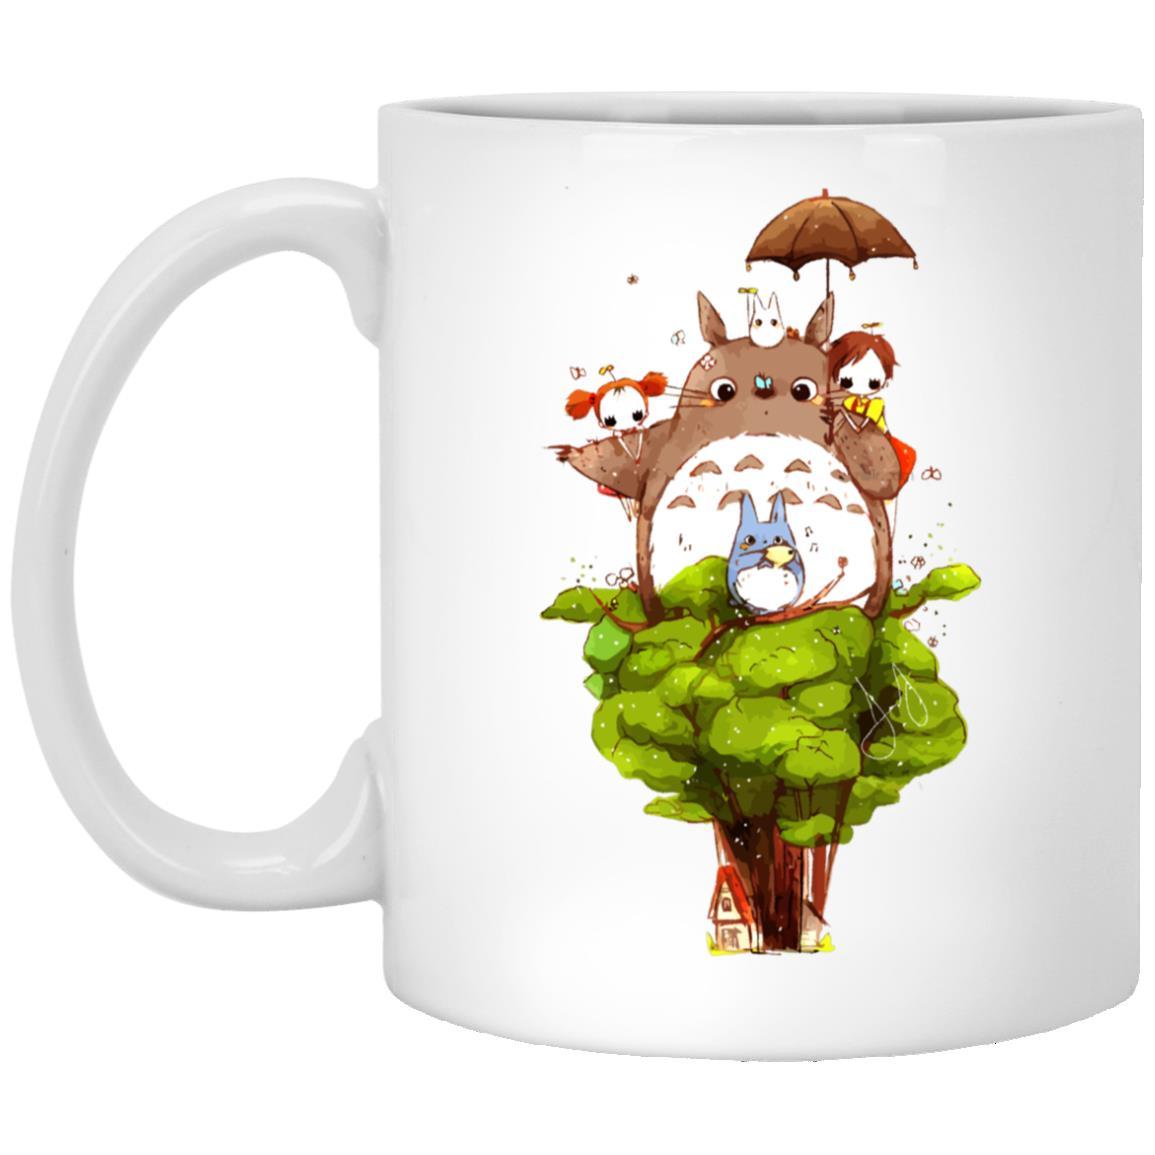 My Neighbor Totoro Characters cartoon Style Mug